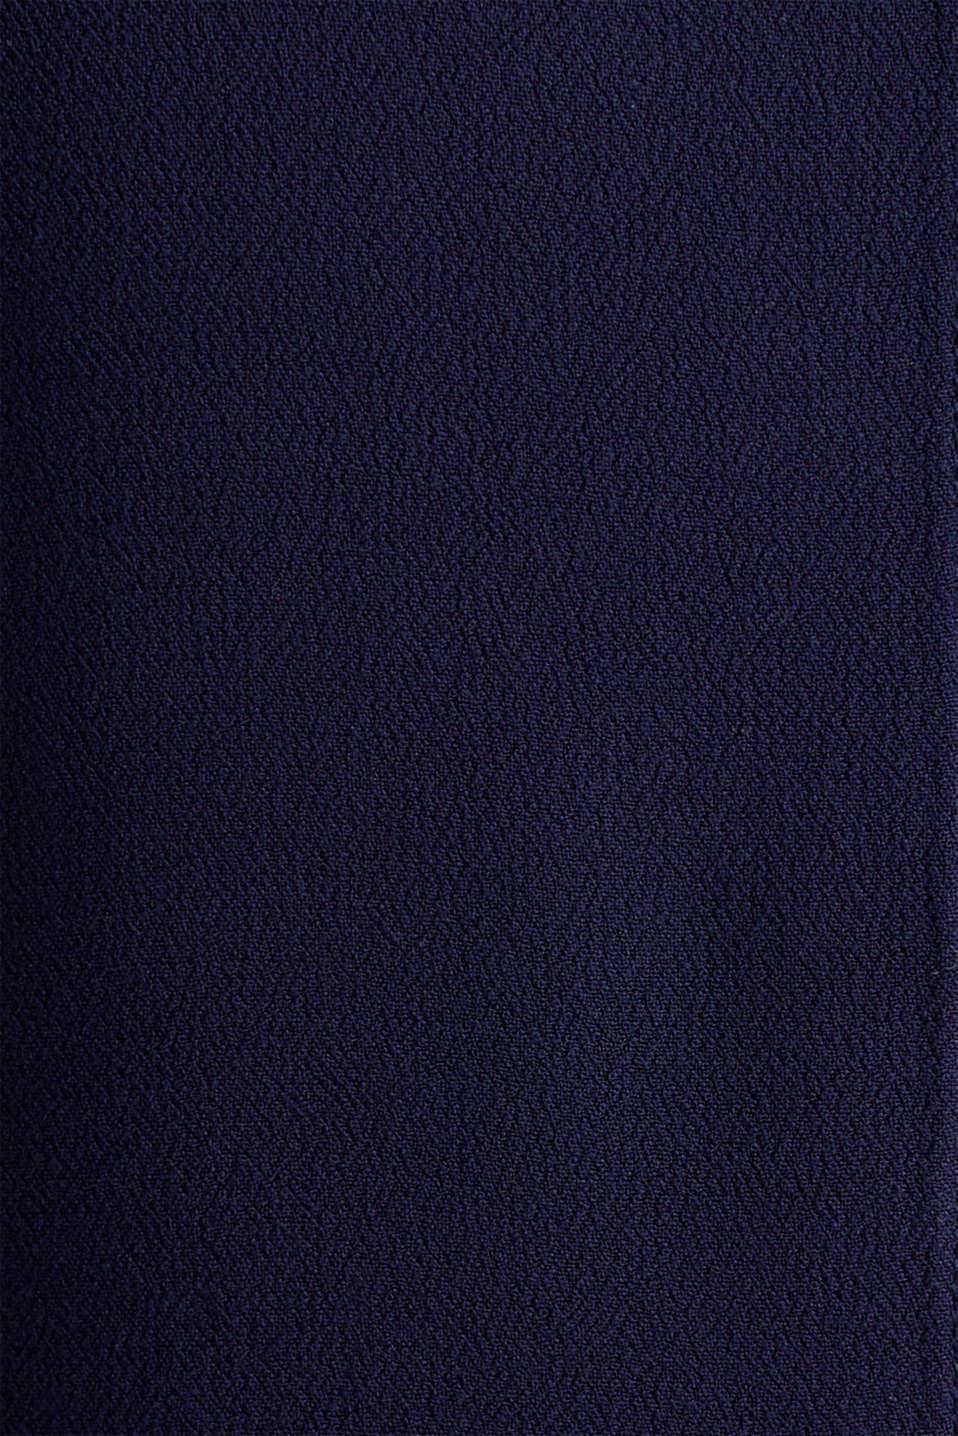 Crêpe blouse top, NAVY, detail image number 4